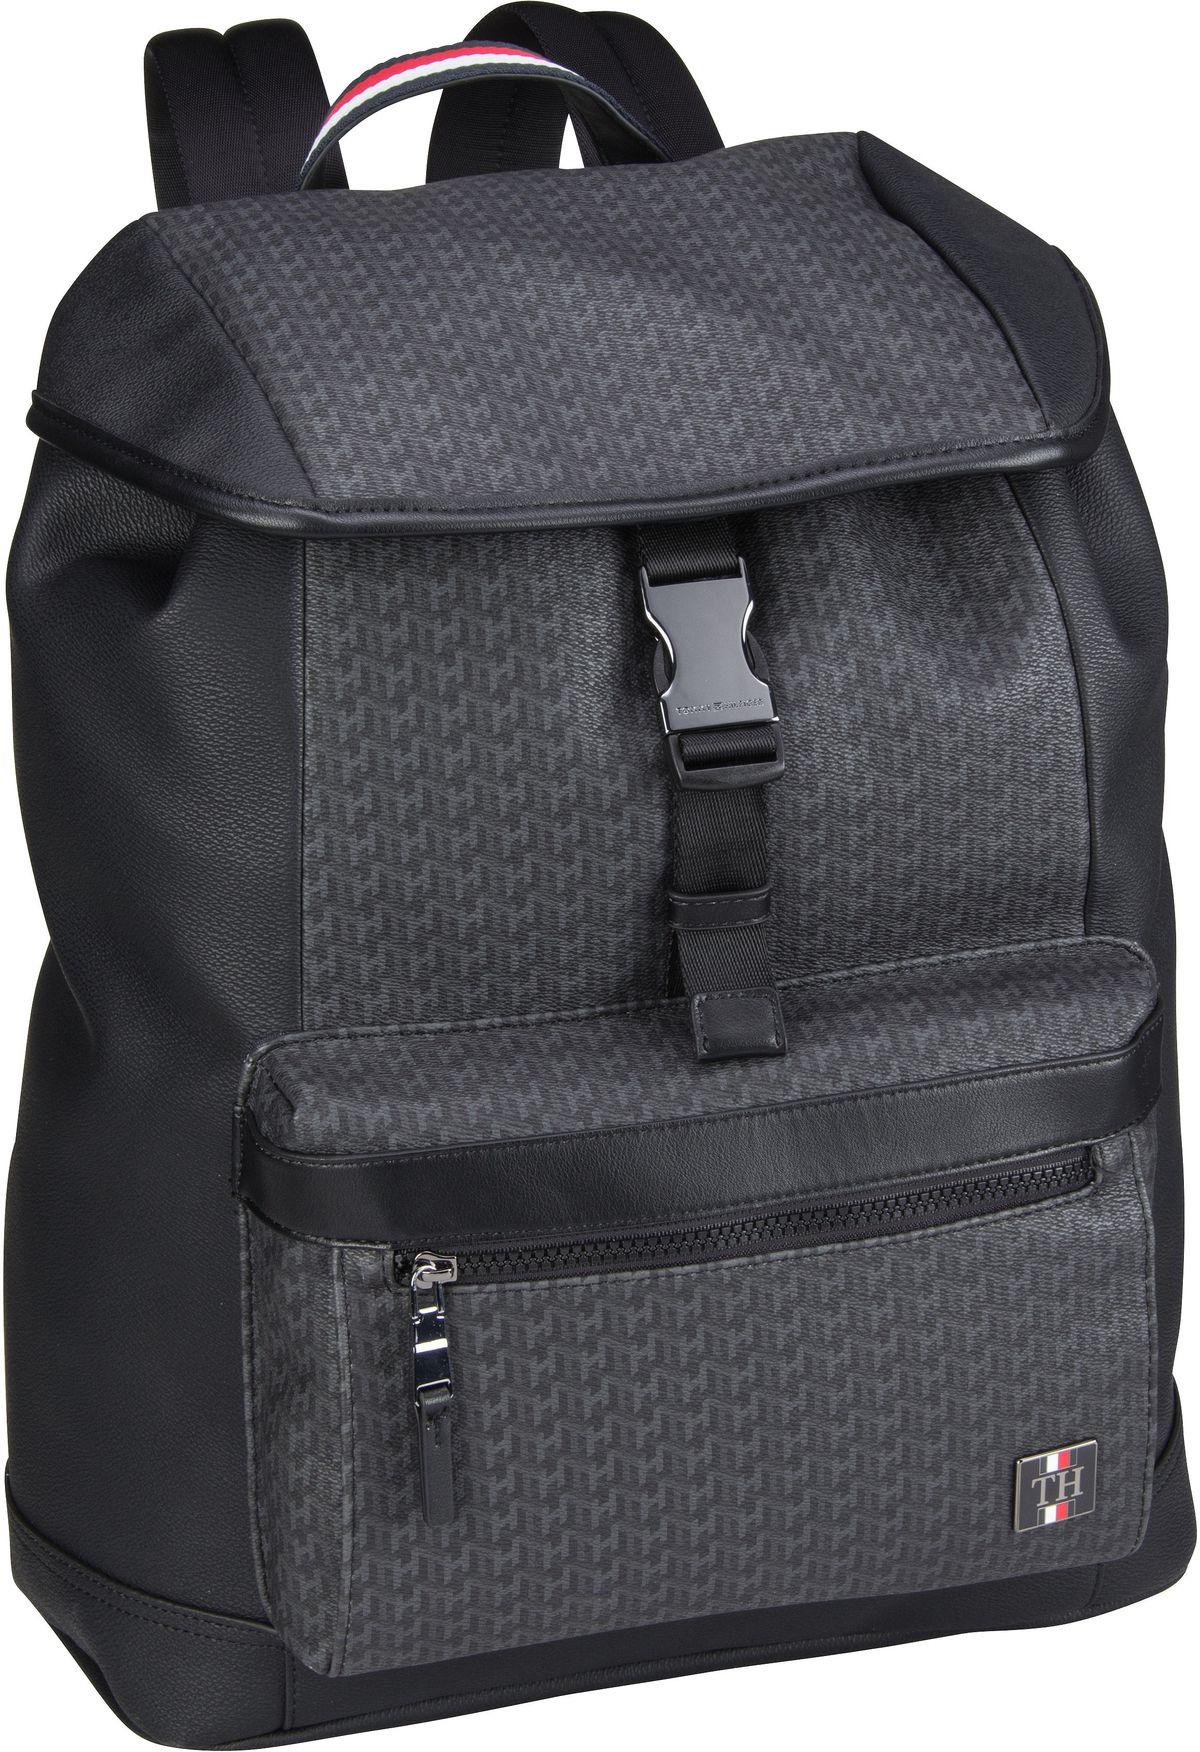 Rucksack / Daypack Coated Canvas Flap Backpack 5267 Black Monogram